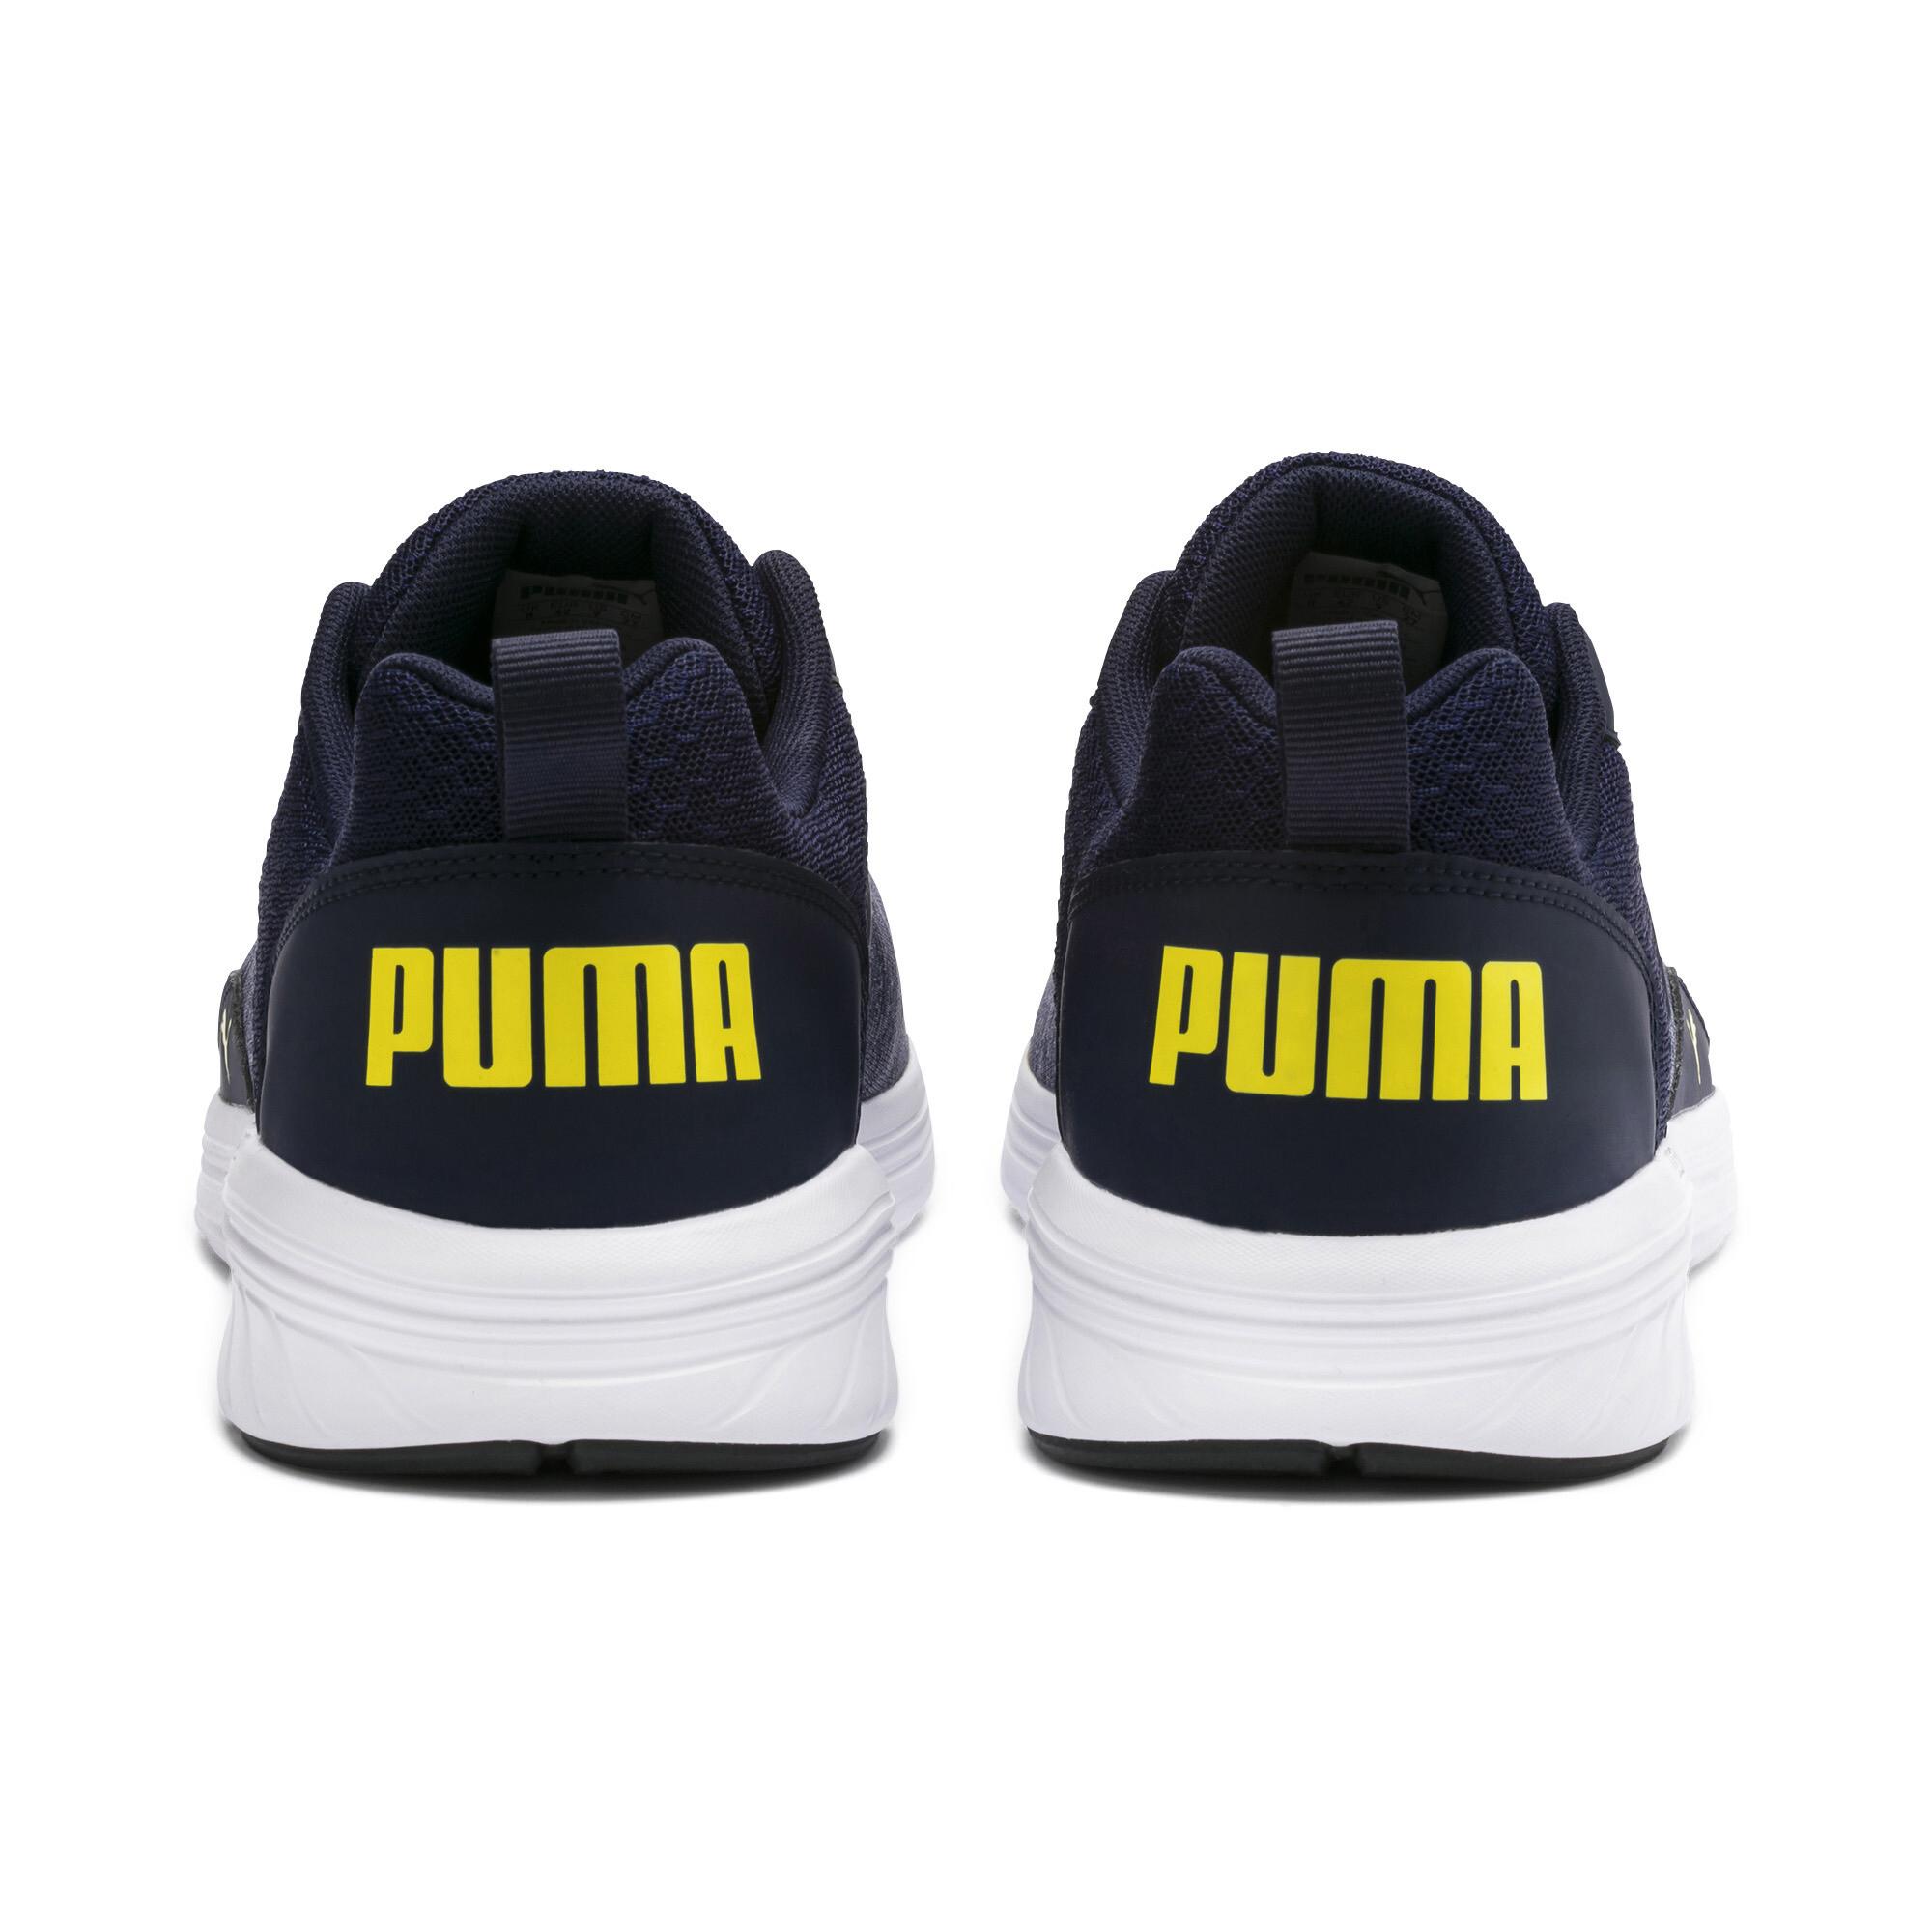 PUMA-NRGY-Comet-Men-039-s-Running-Shoes-Men-Shoe-Running thumbnail 14